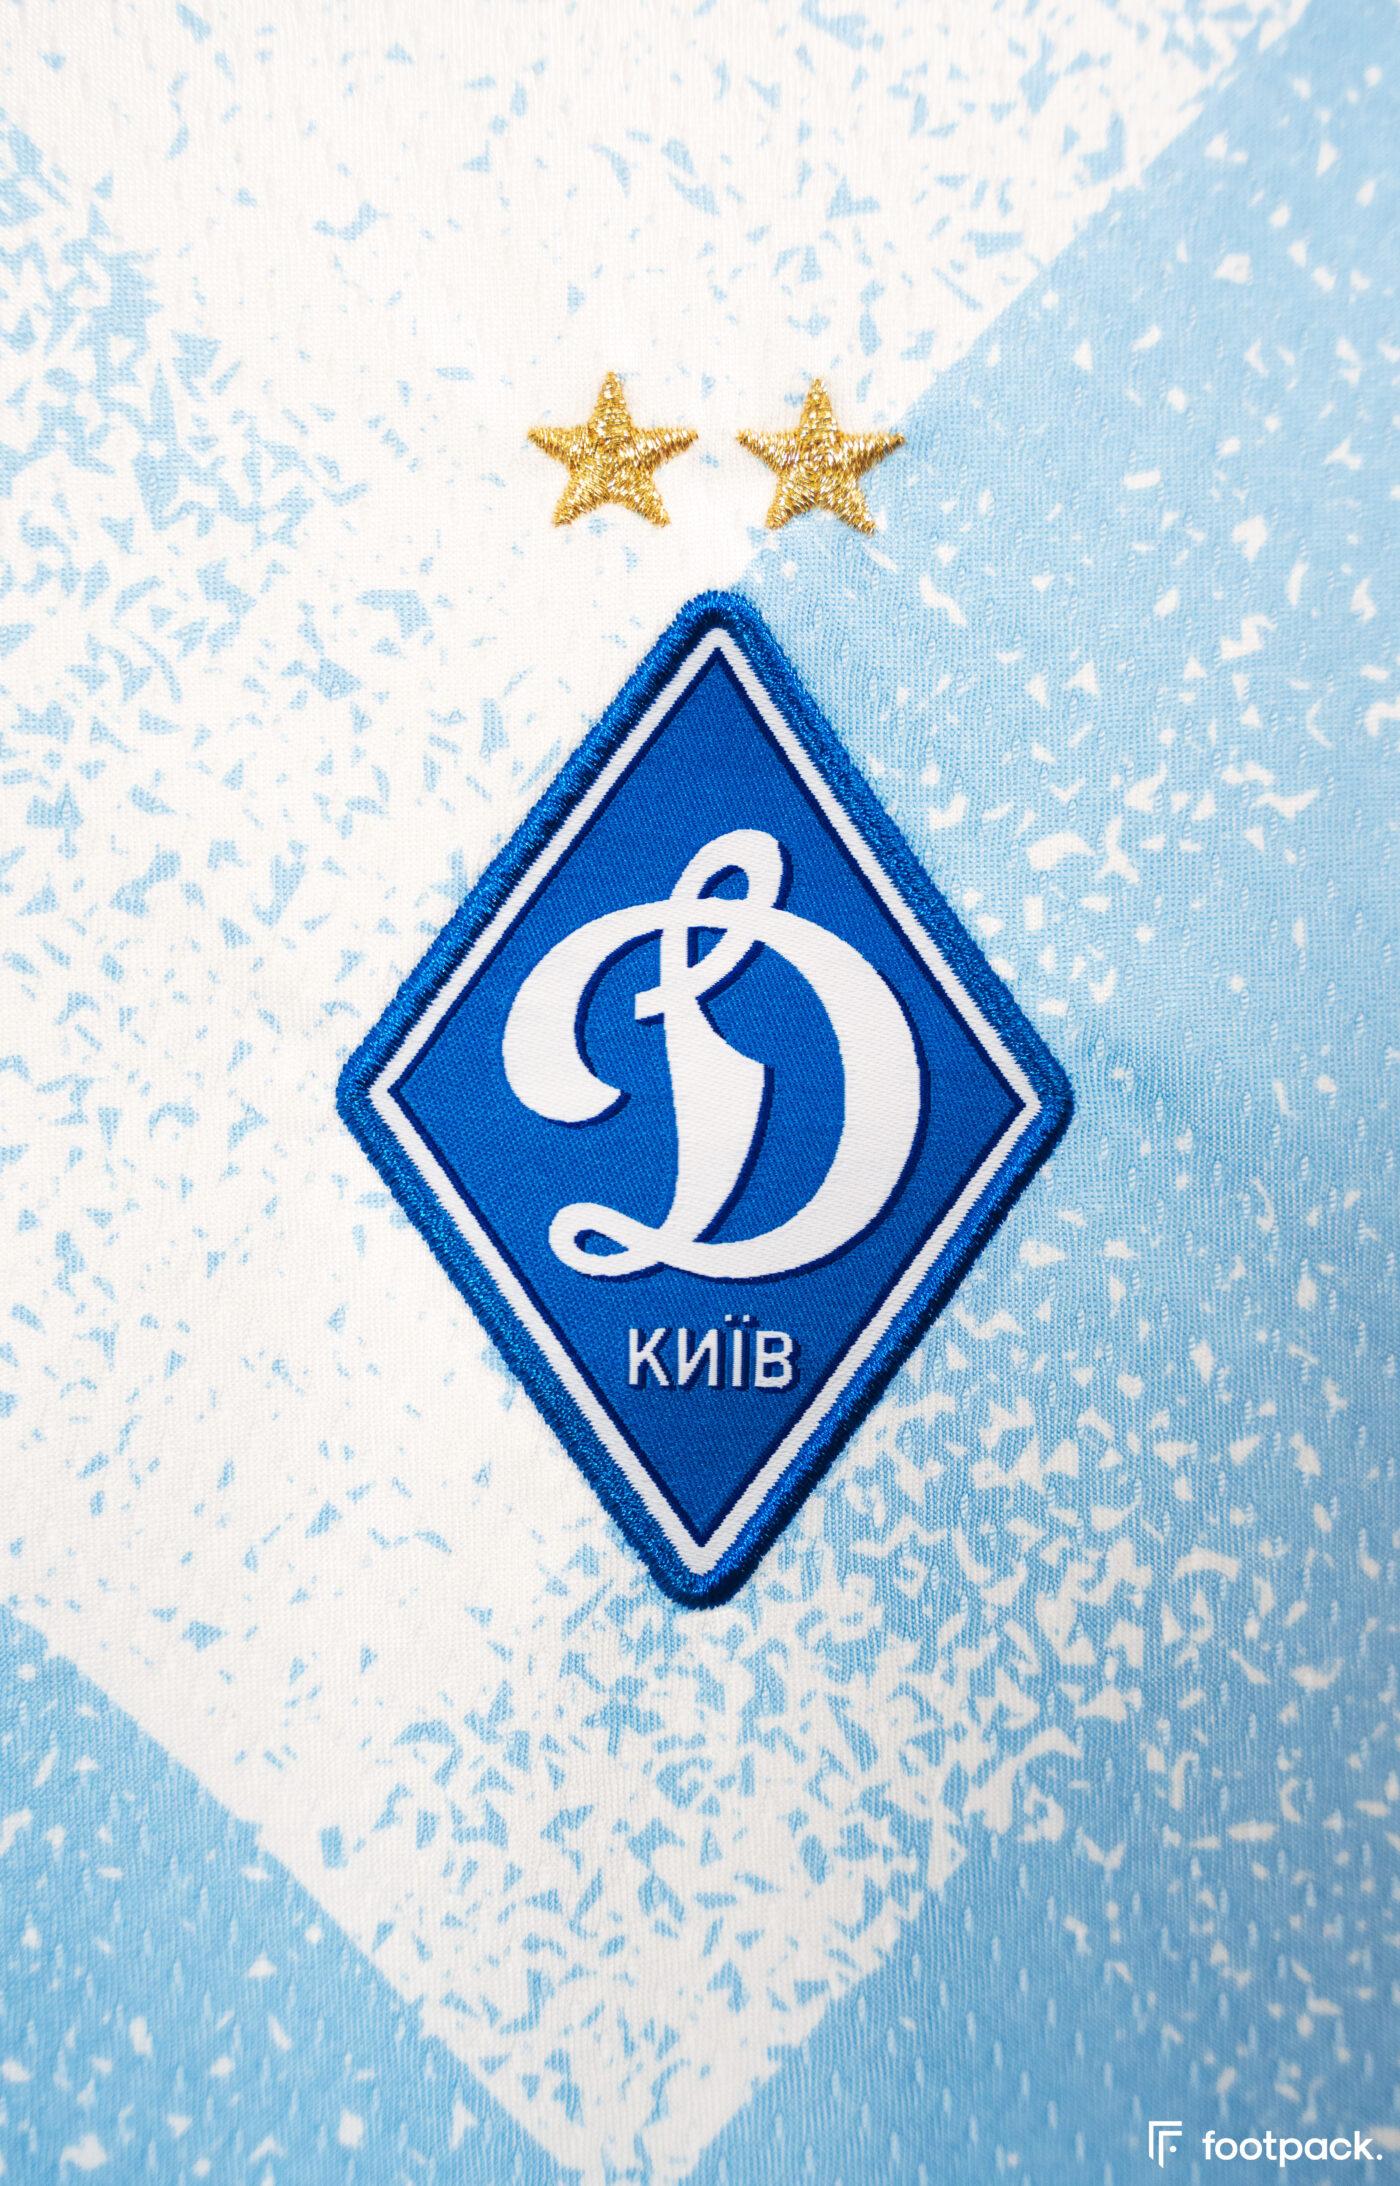 maillot dynamo kiev 2021 2022 domicile new balance footpack-3